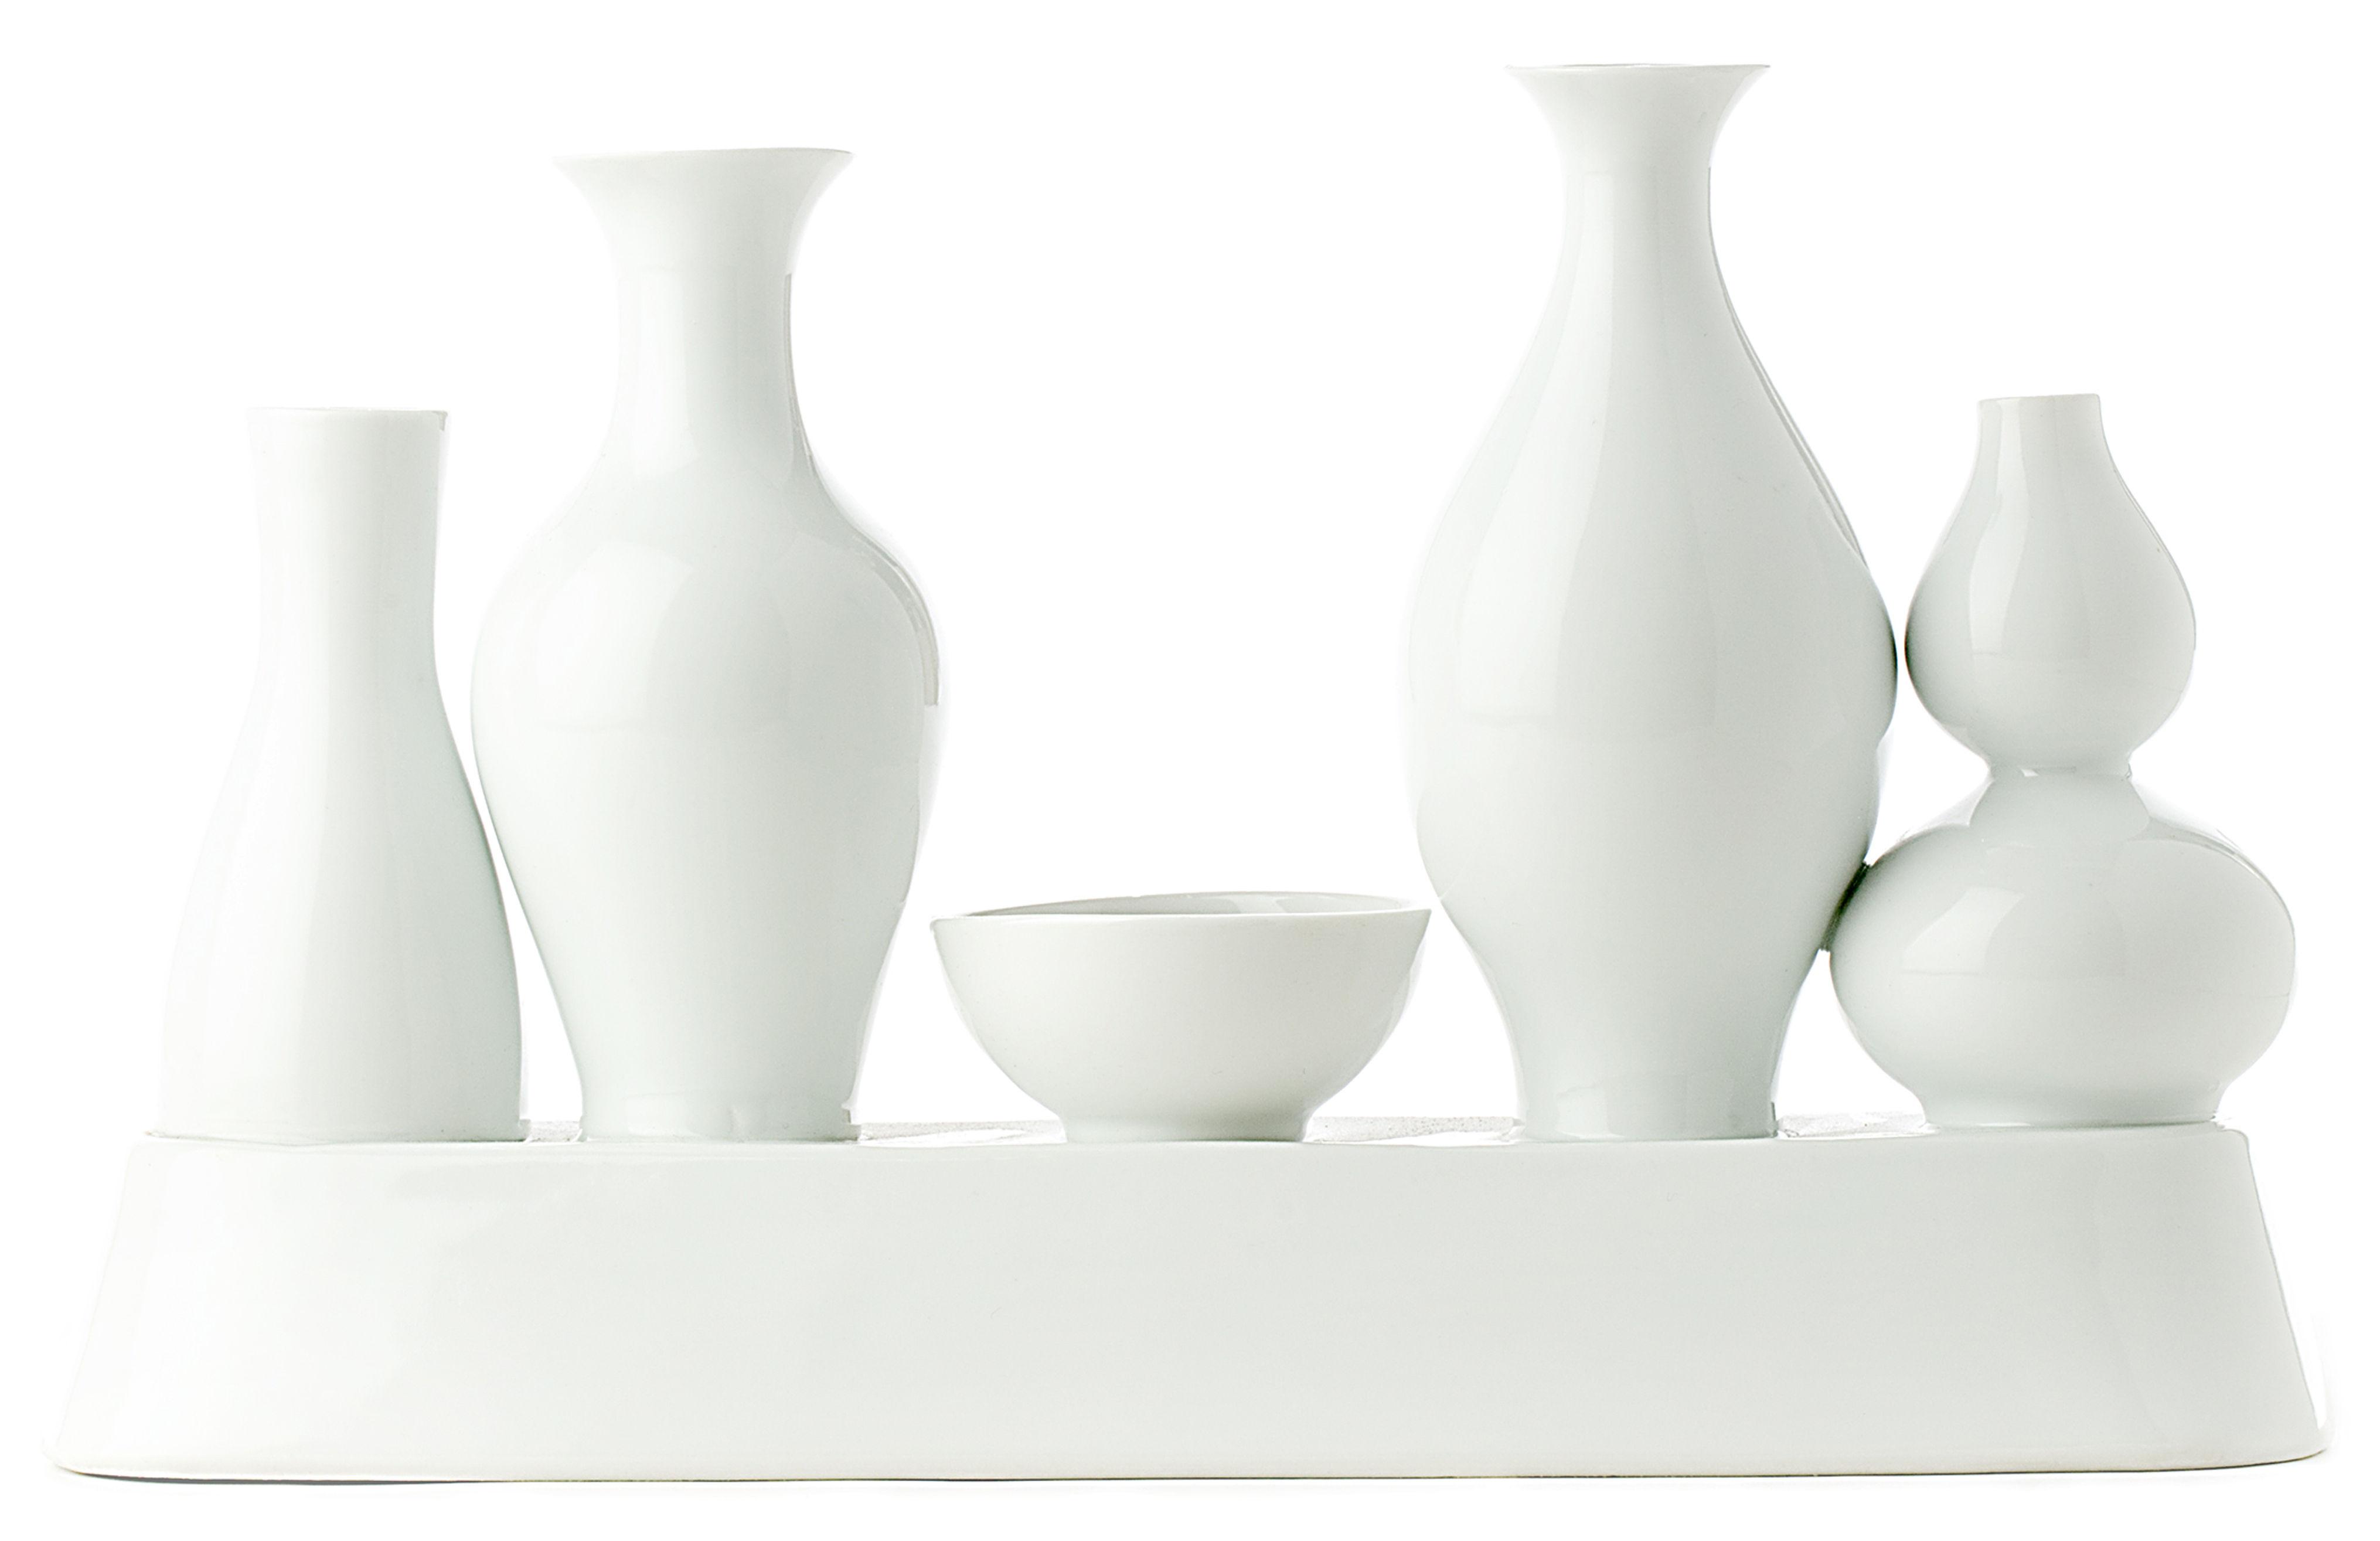 Interni - Vasi - Vaso Shanghai di Pols Potten - Bianco - Porcellana verniciata